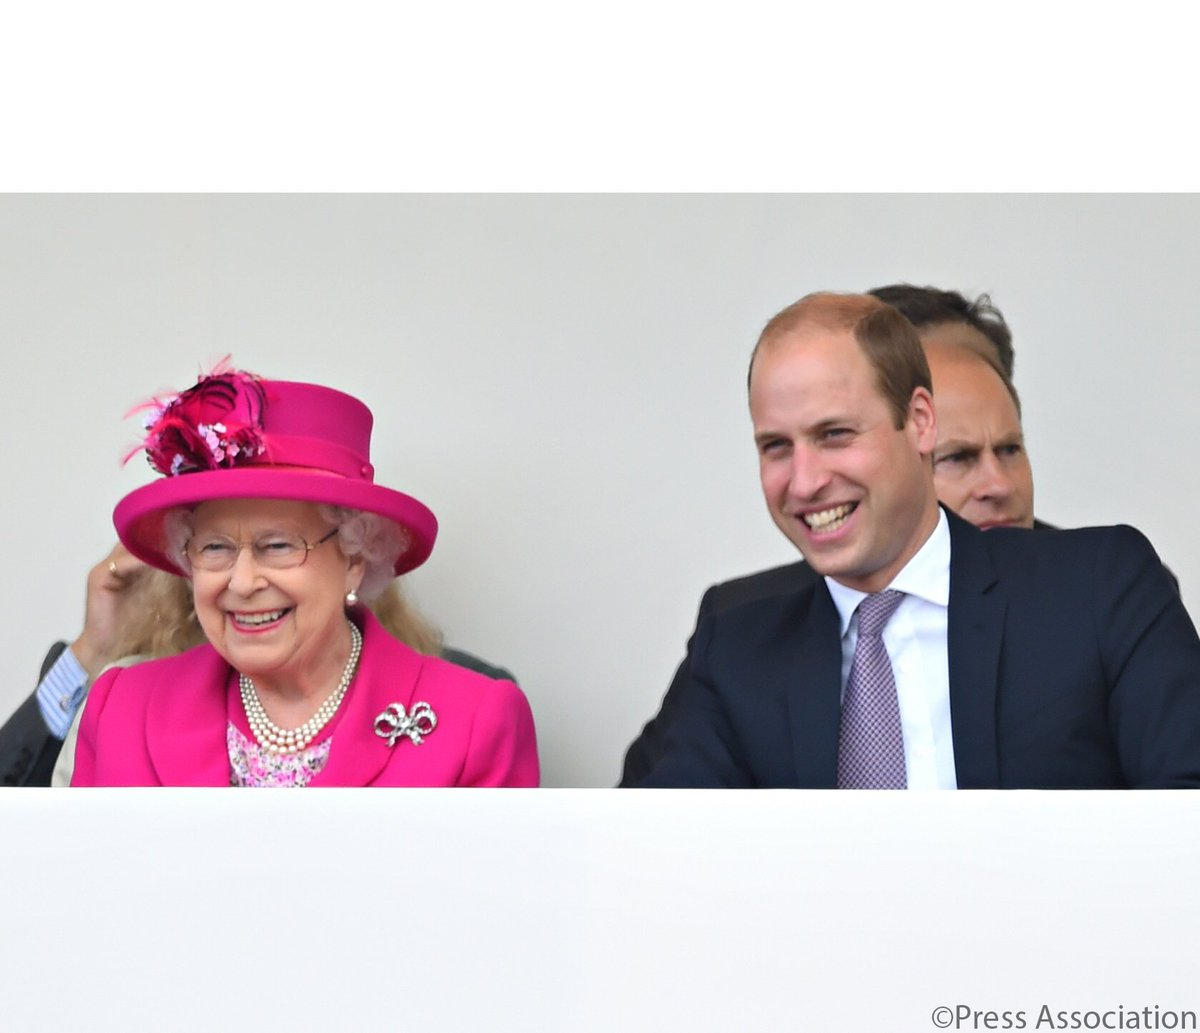 Wishing The Duke of Cambridge a very Happy 36th Birthday!   #HappyBirthdayHRH